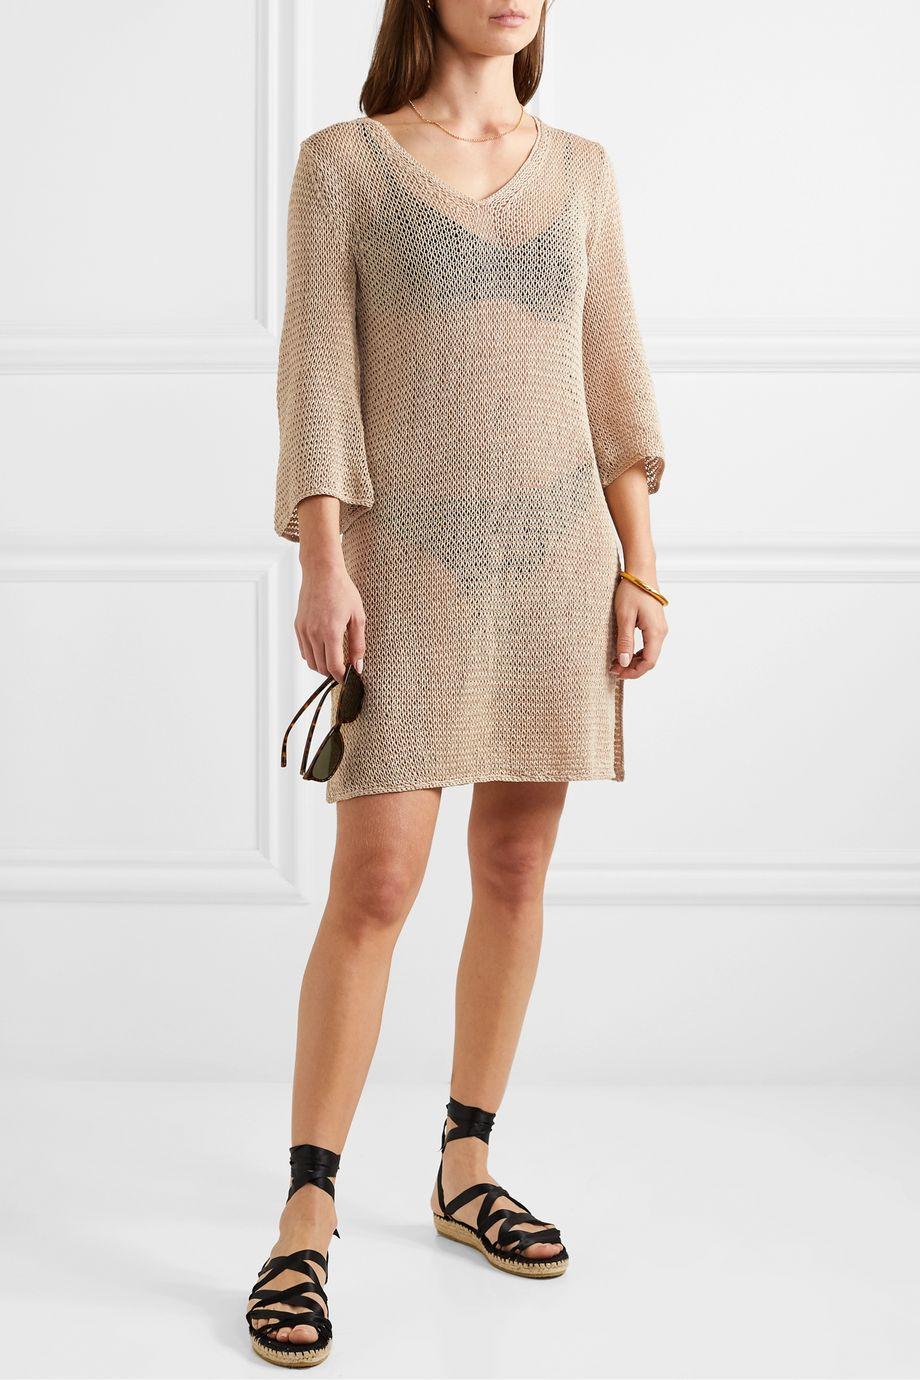 Skin Lenora Minikleid aus gehäkelter Baumwolle